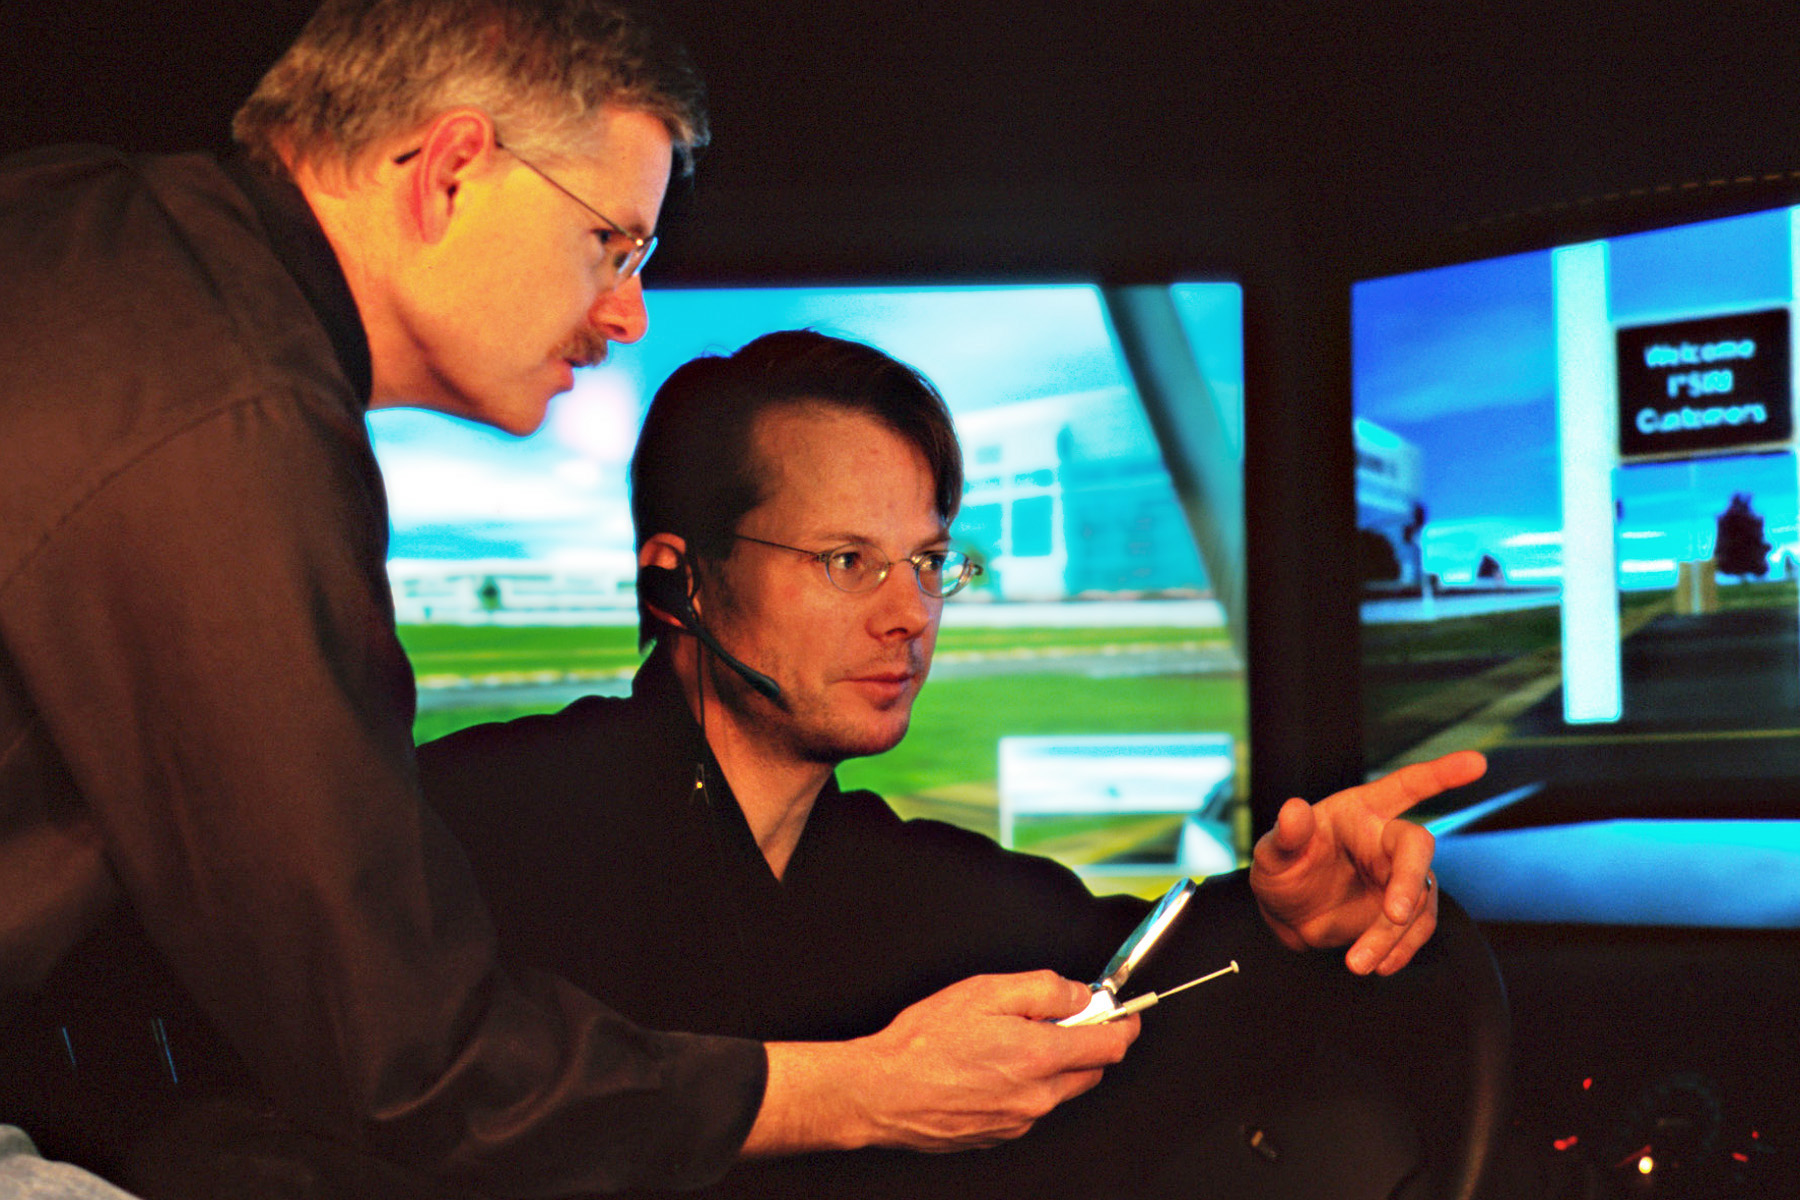 U psychologists David Strayer (left) and Frank Drews in driver simulator in laboratory.